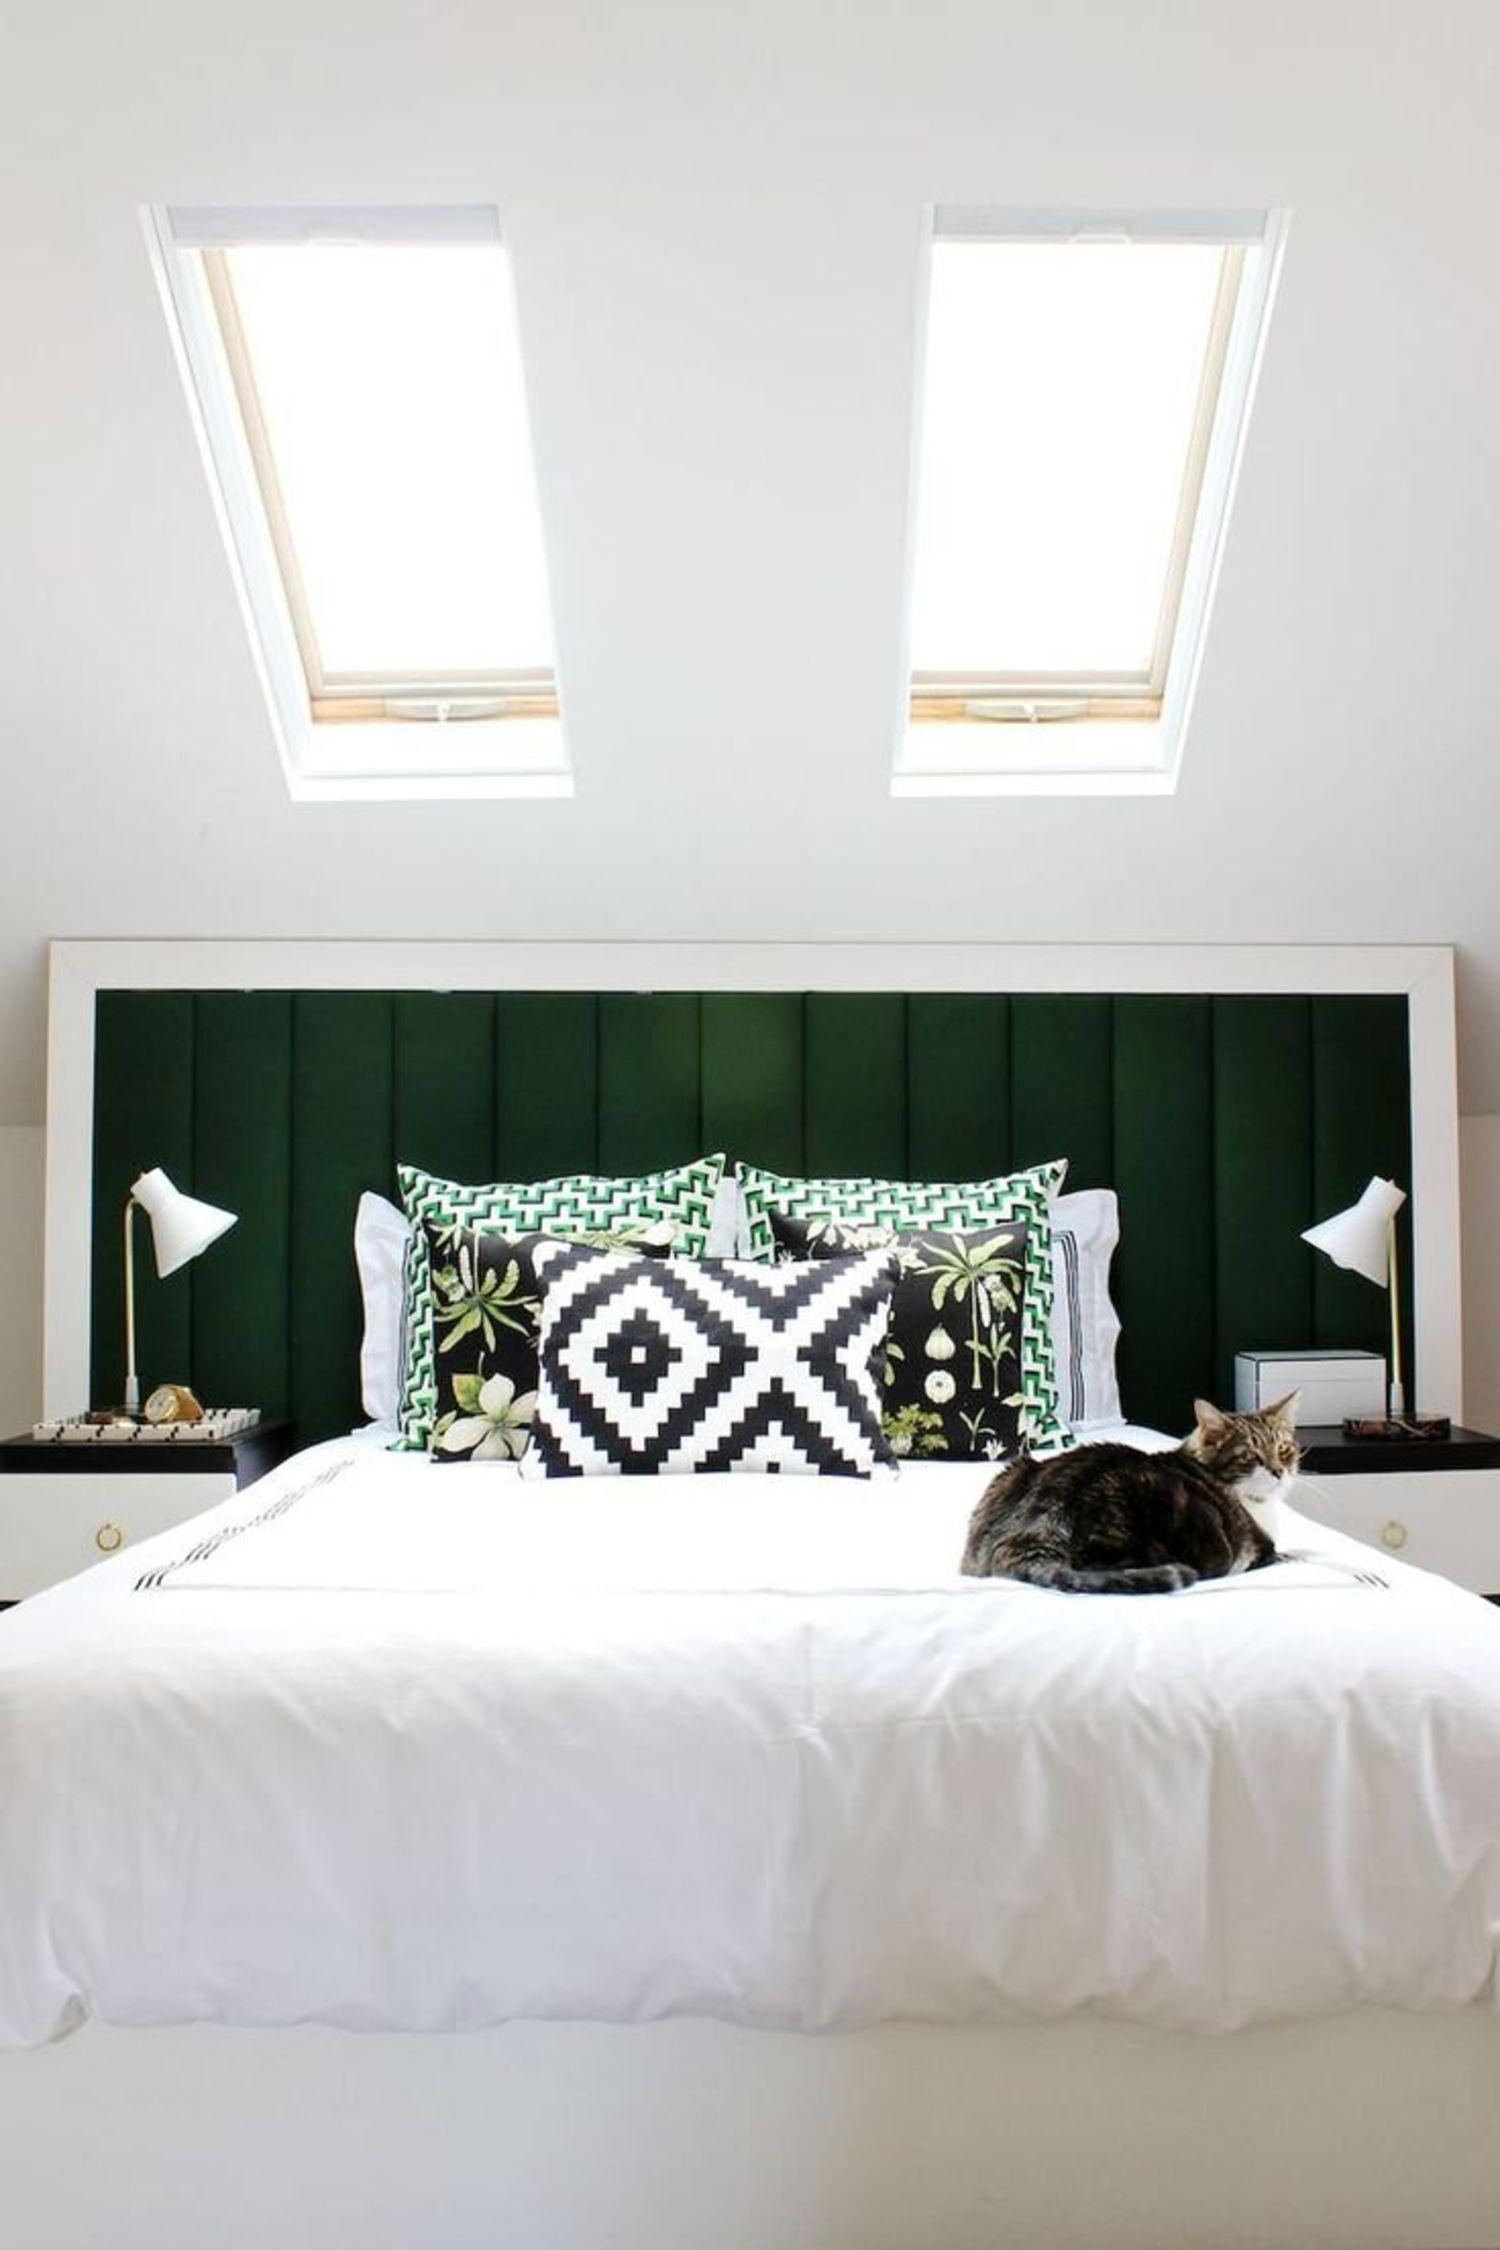 Diy homemade headboard ideas apartment therapy solutioingenieria Gallery